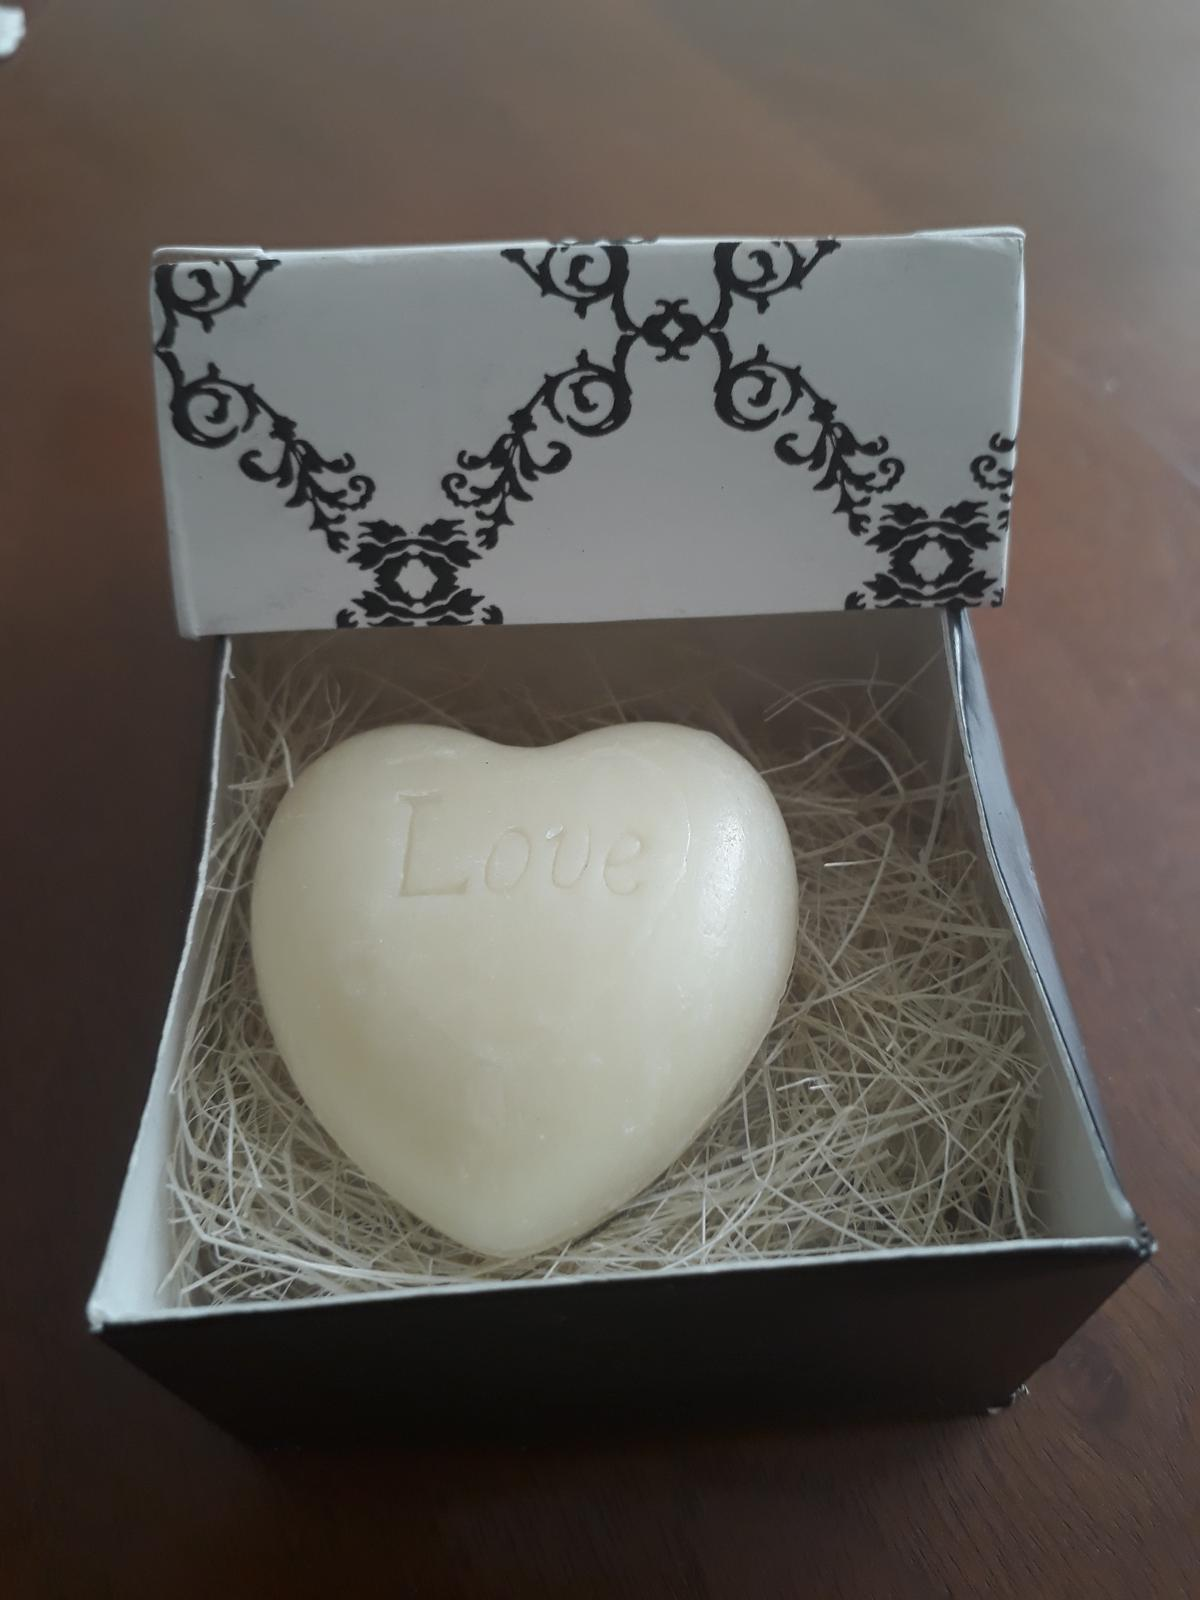 Mydielko v tvare srdca v krabičke - Obrázok č. 2